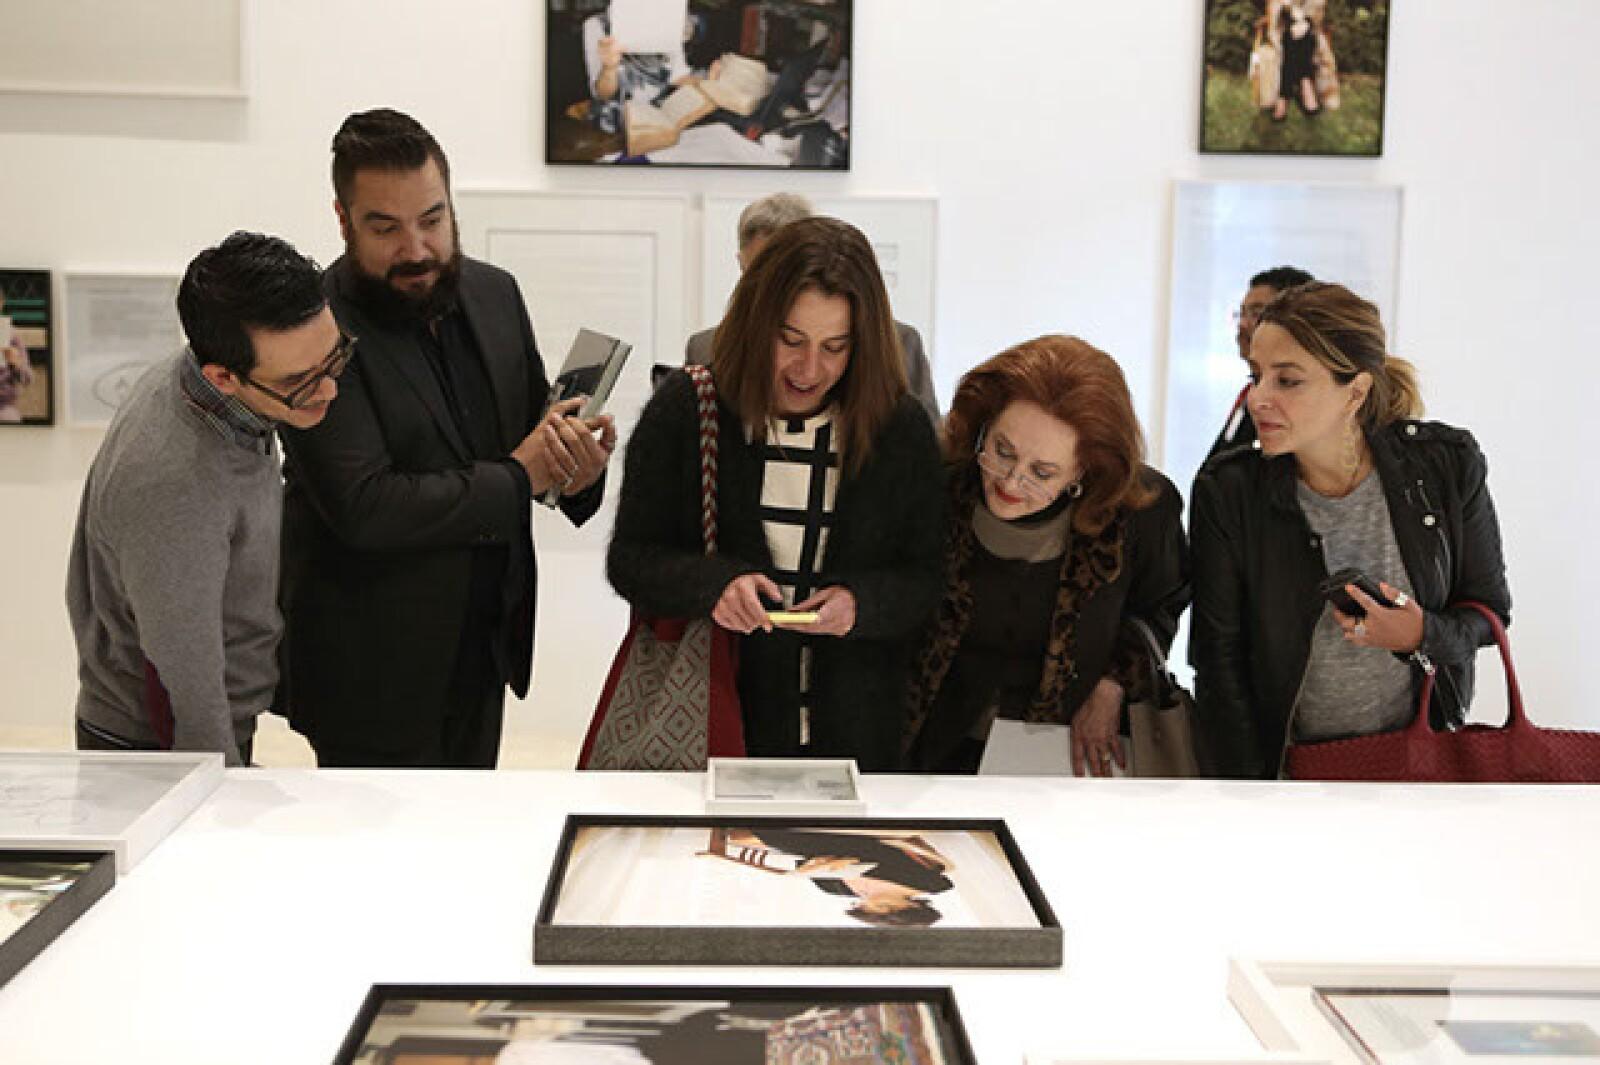 Manolo Caro, Juan Carlos Campos, Ruth Ovseyevitz, Patricia Barrios Gómez, Luisa Serna